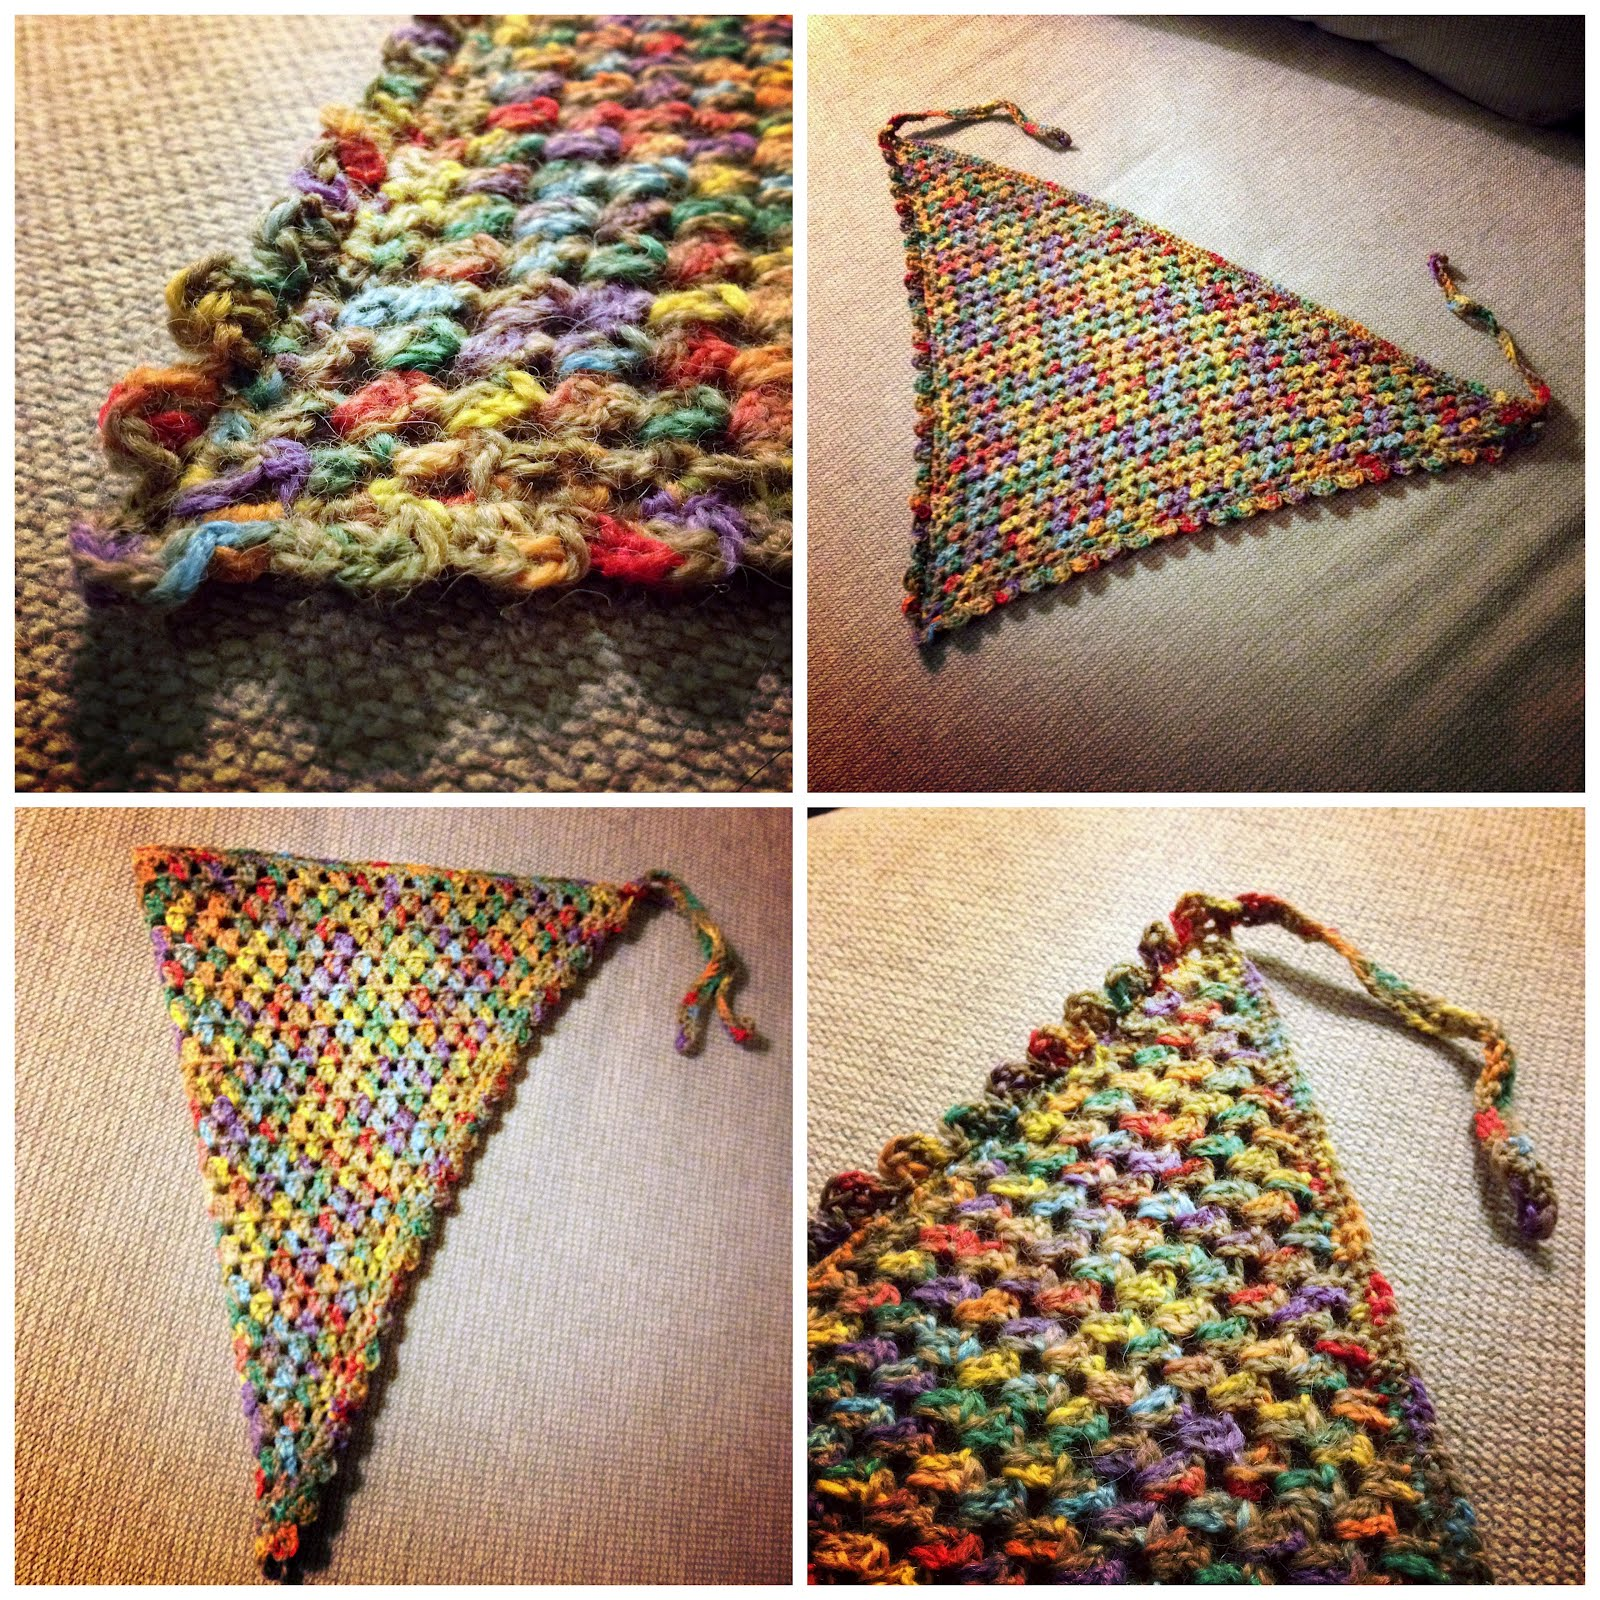 Crocheting Blind Crochet Project Head Scarf